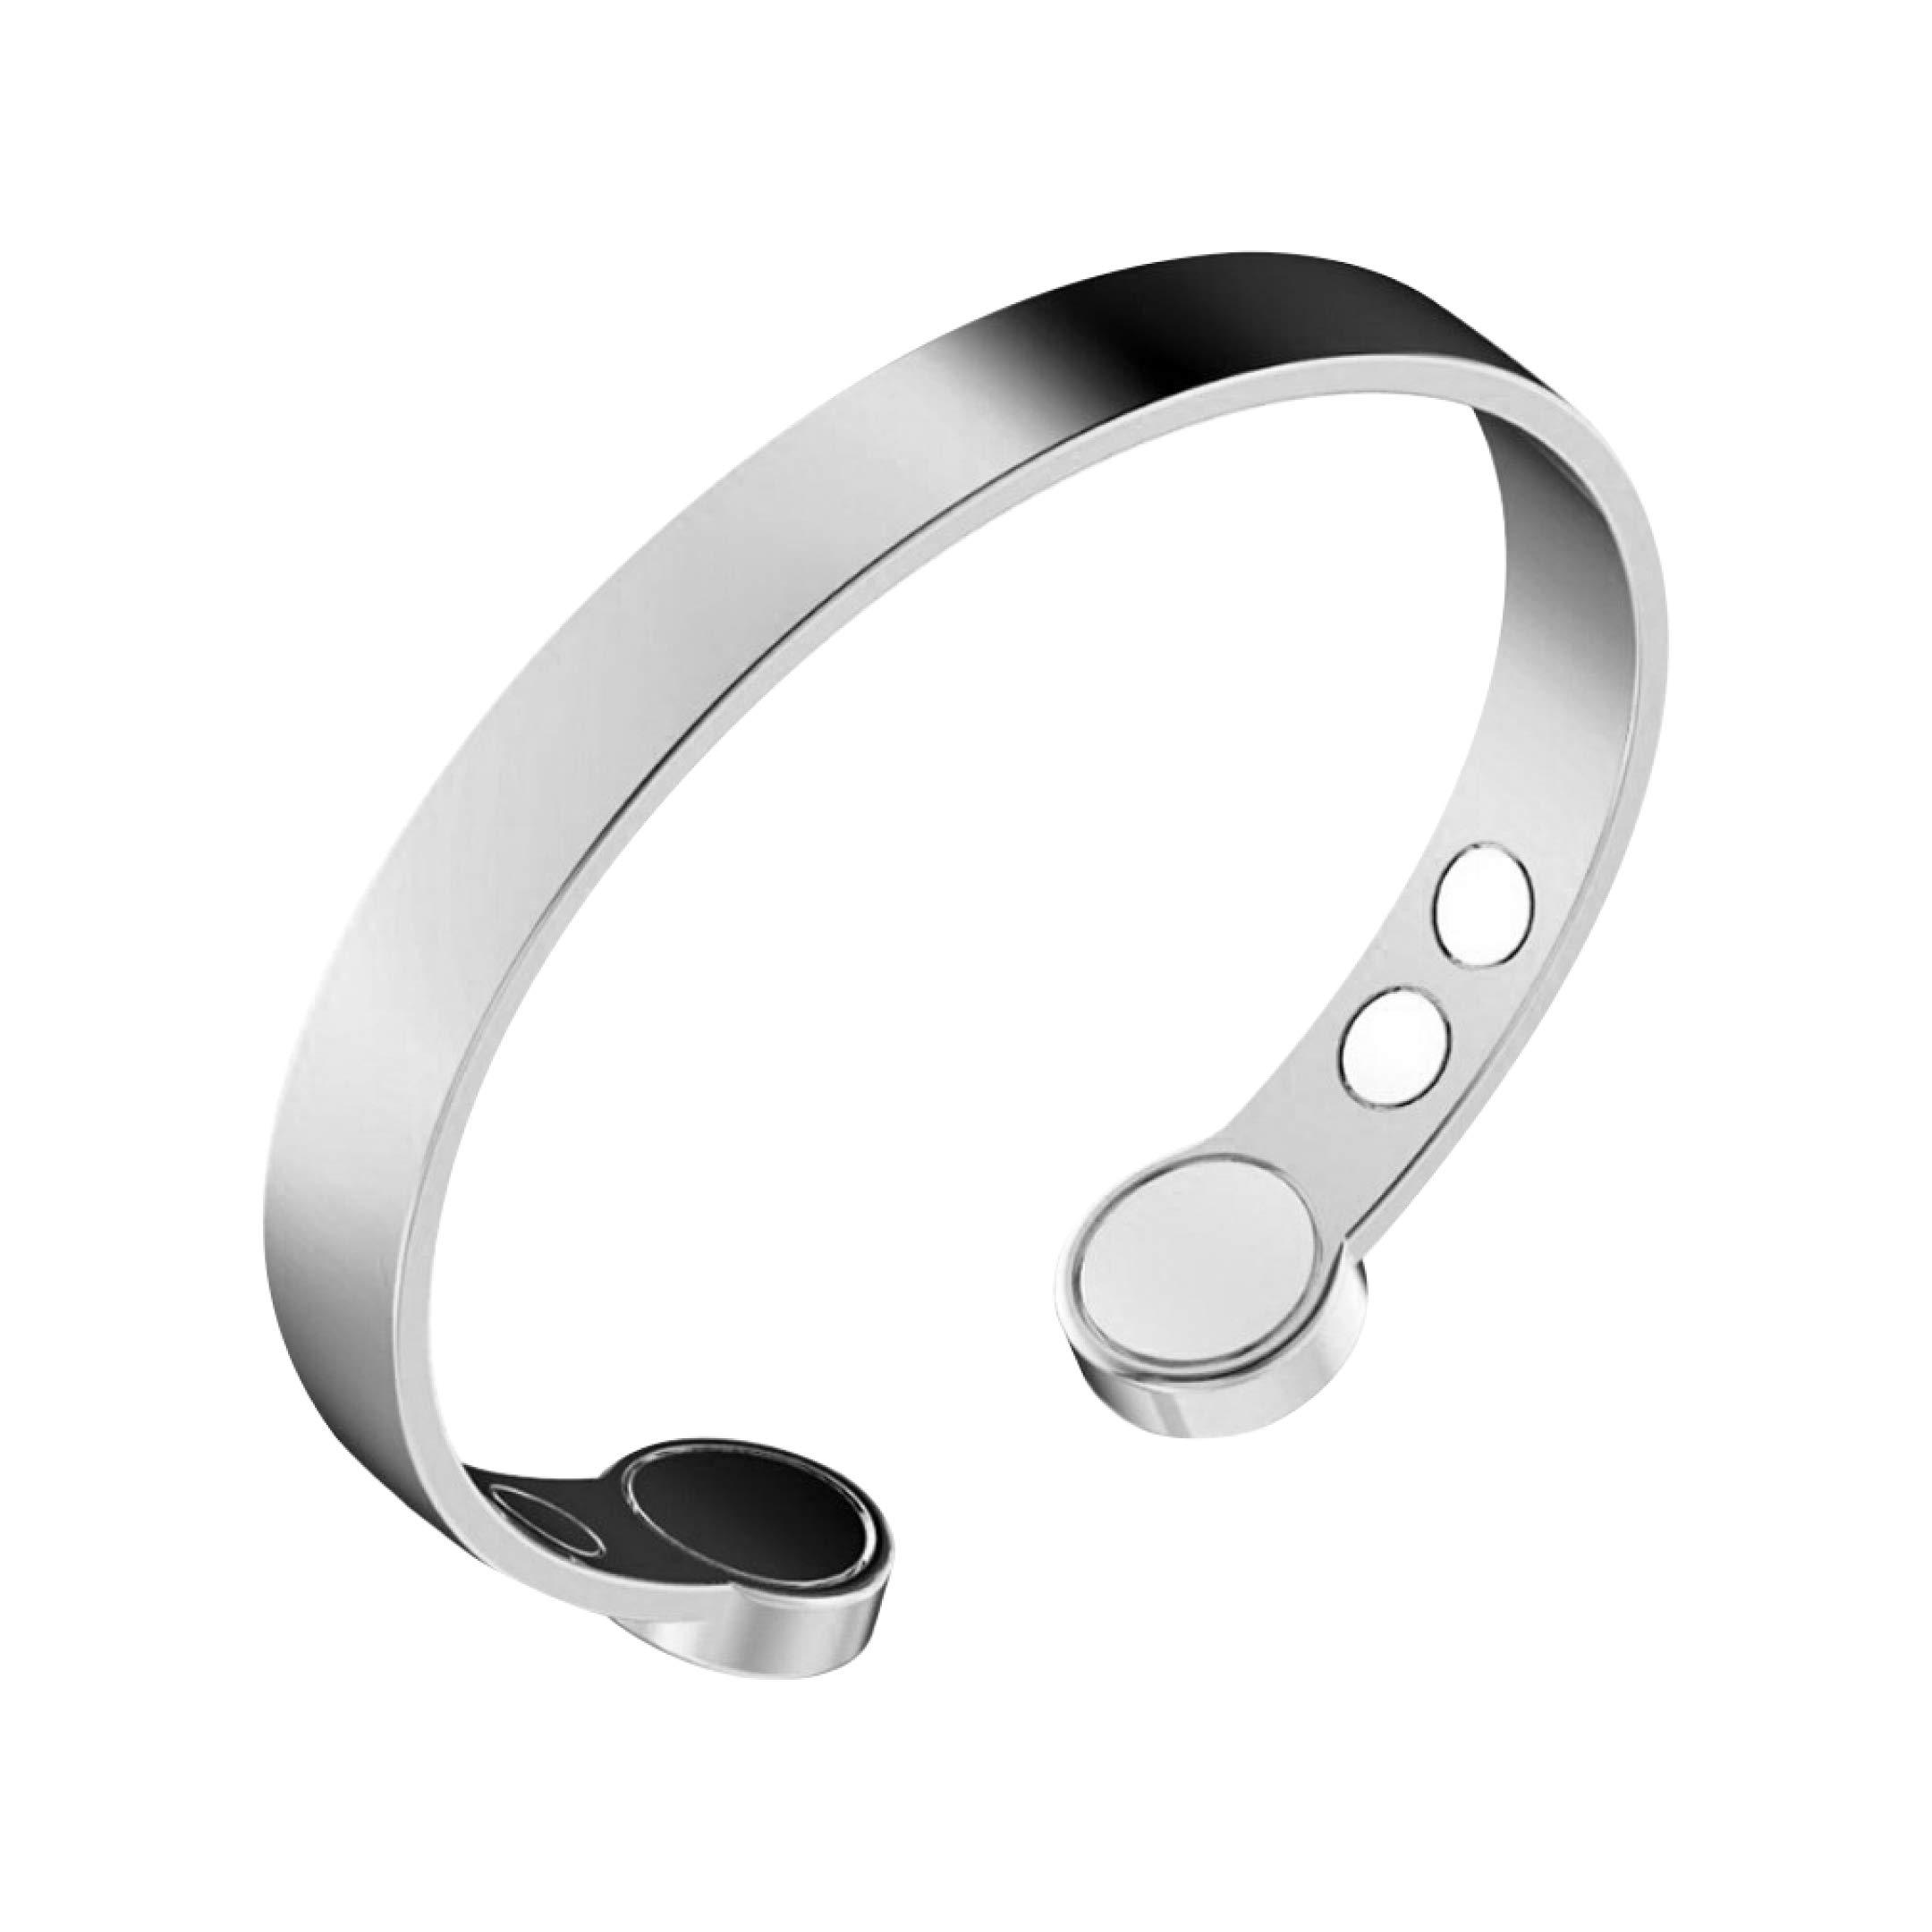 Rosian & Levine Copper Bracelet for Arthritis, Migraine & Pain Relief, Osteoarthritis, Menopause Support, Hot Flushes, Carpal Tunnel Silver Plated Magnetic Bracelets Sale Gift Men Women